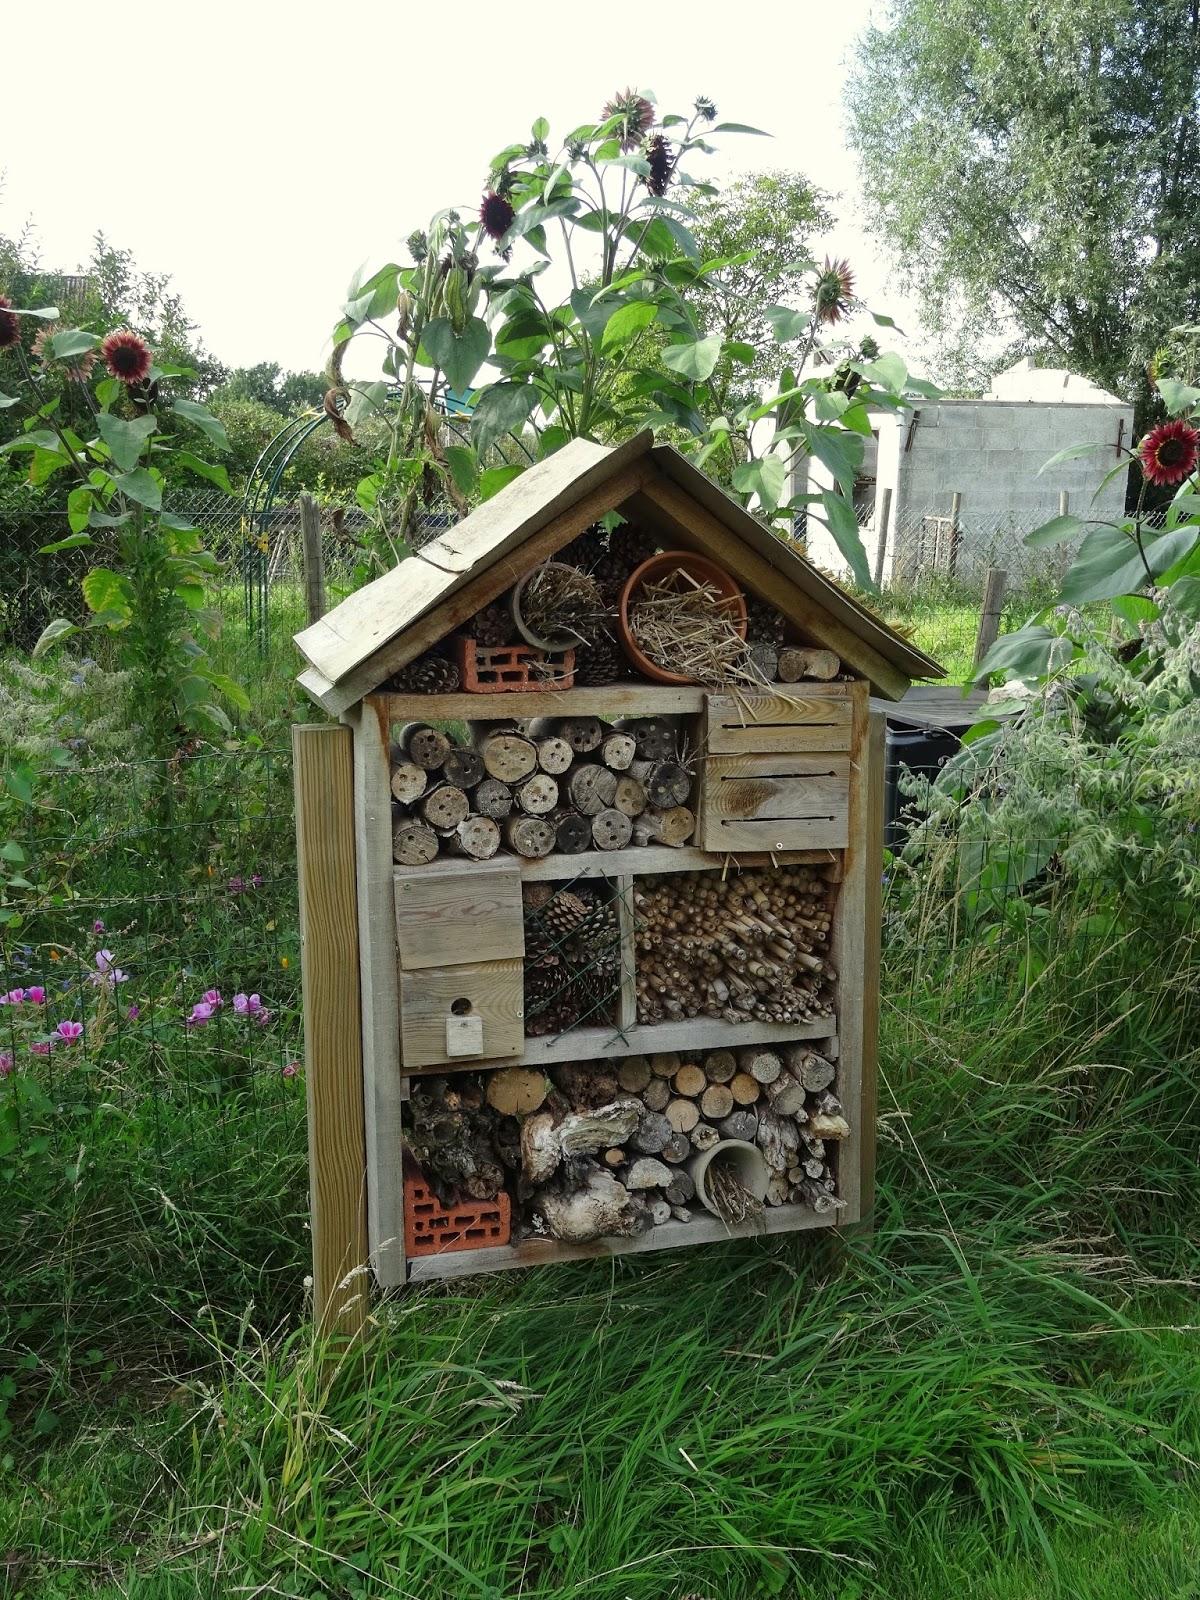 le blog du bricolage idiot h tel insectes. Black Bedroom Furniture Sets. Home Design Ideas